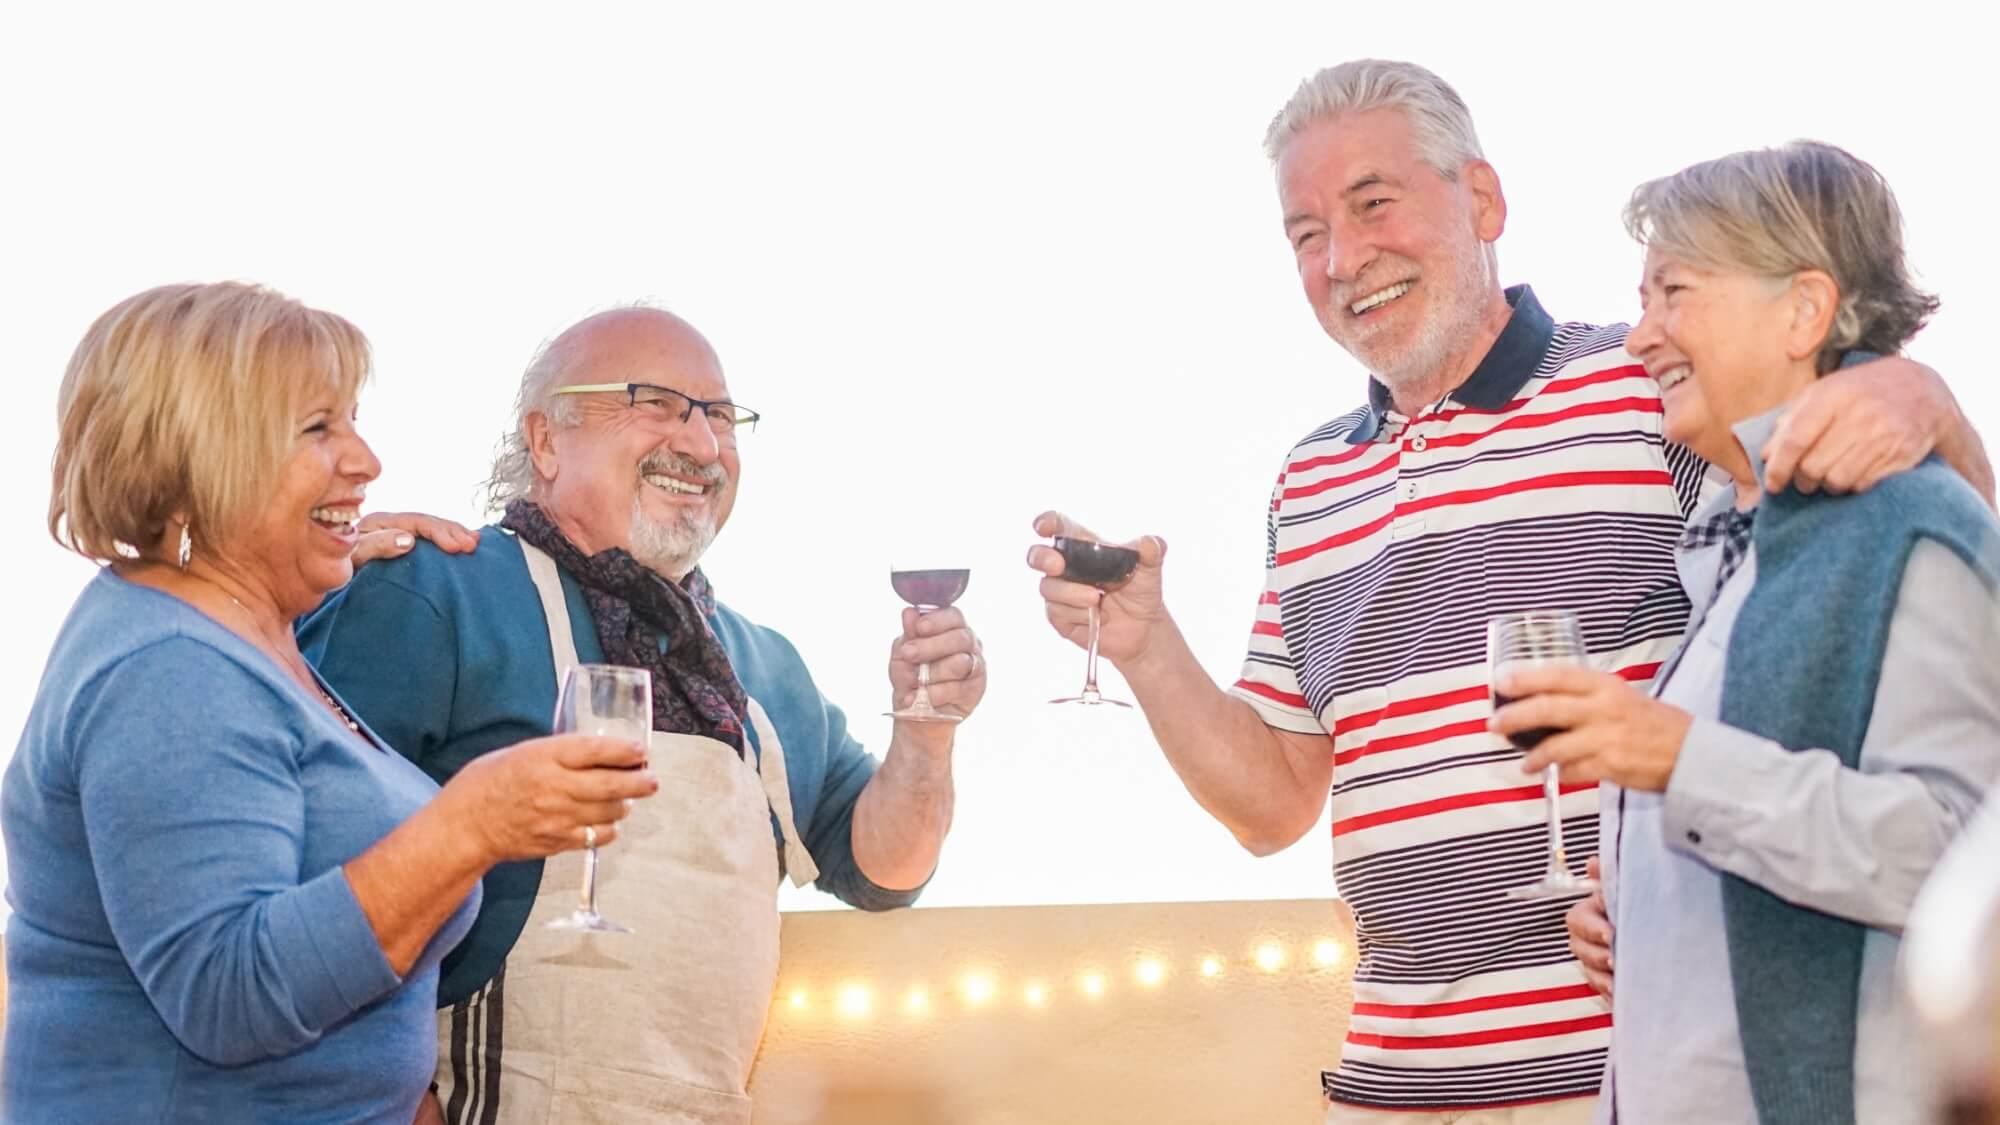 Senior couples drinking wine together having fun.